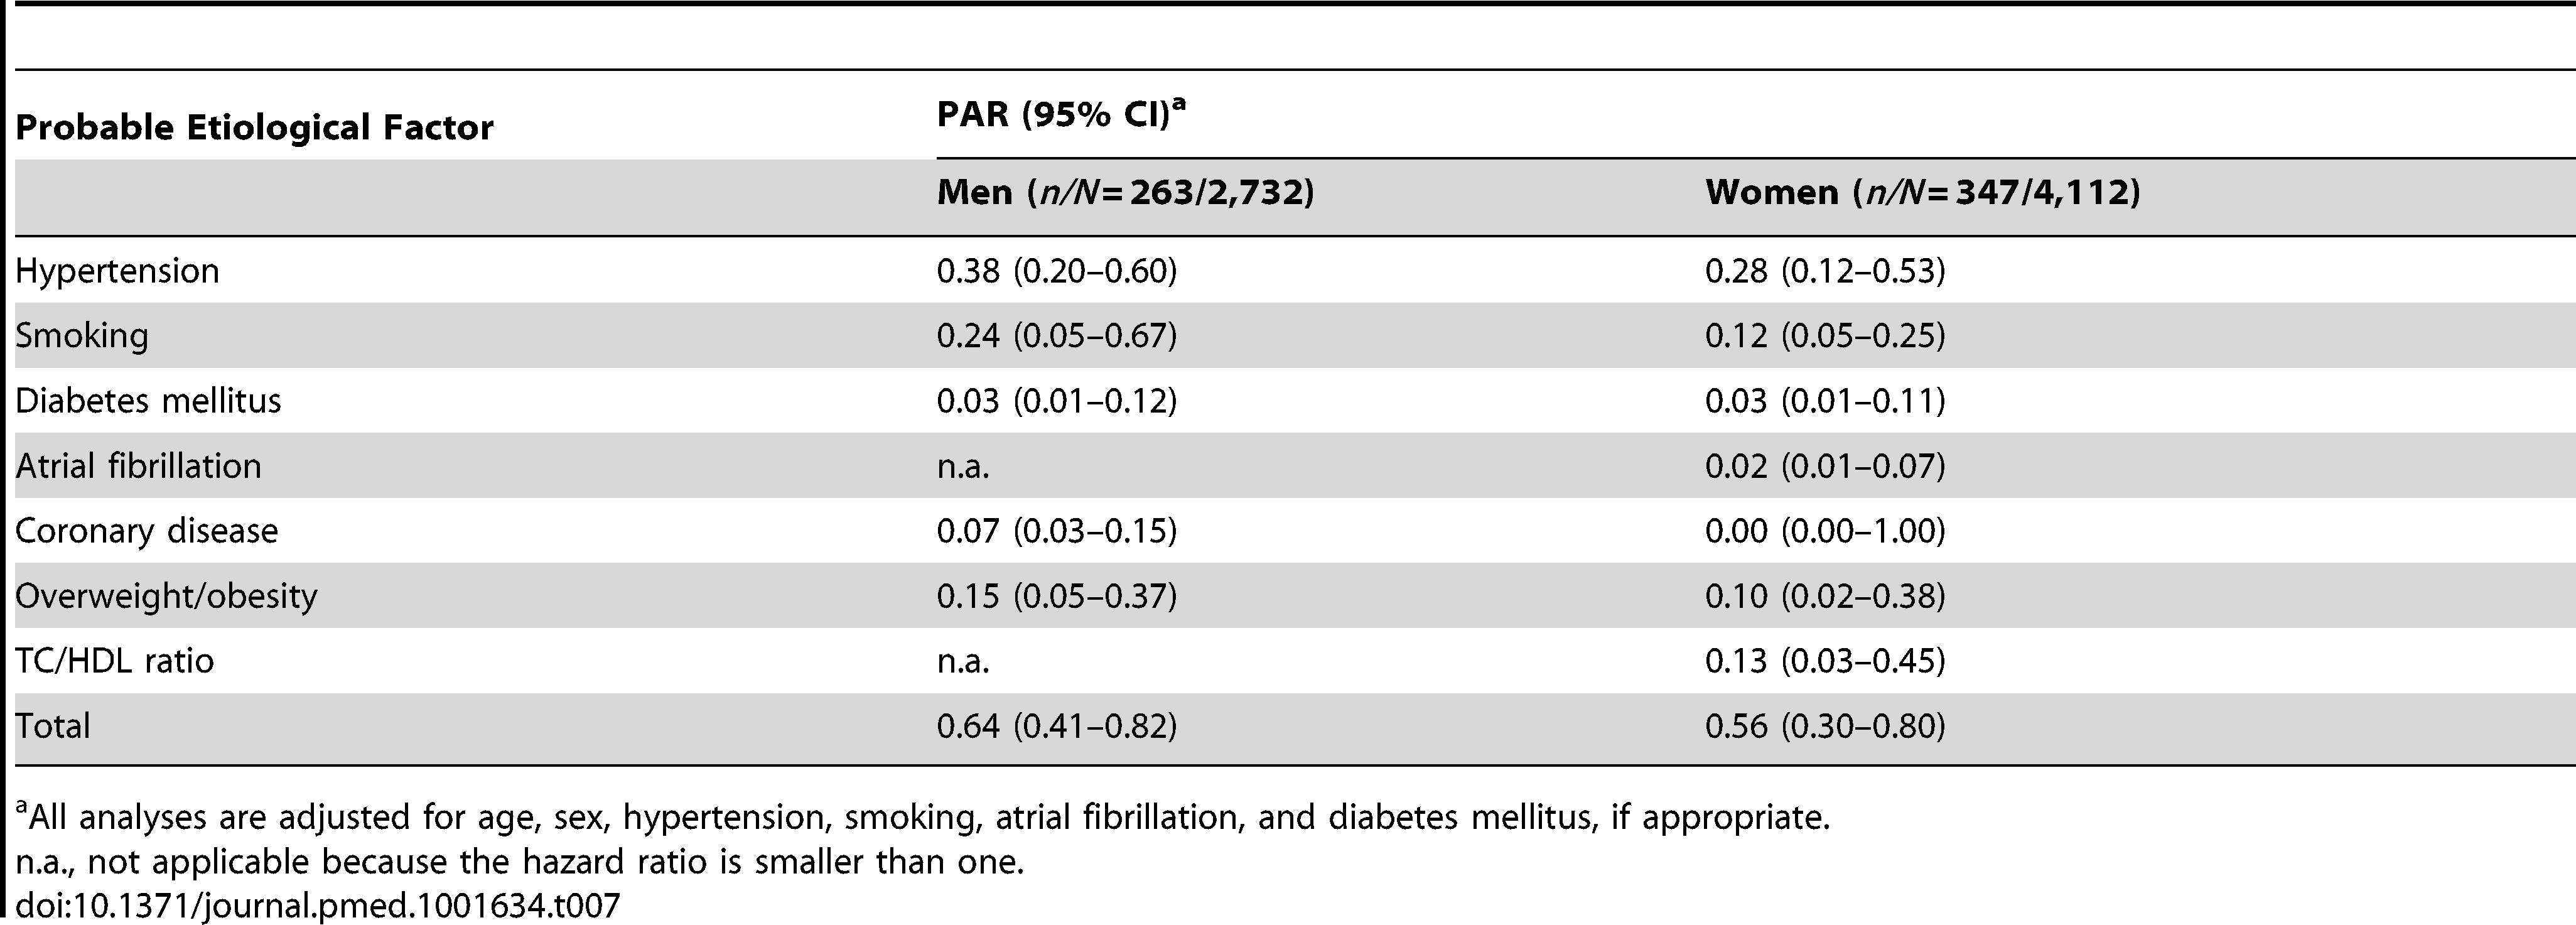 Population attributable risks of presumed etiological factors for ischemic stroke: men and women.